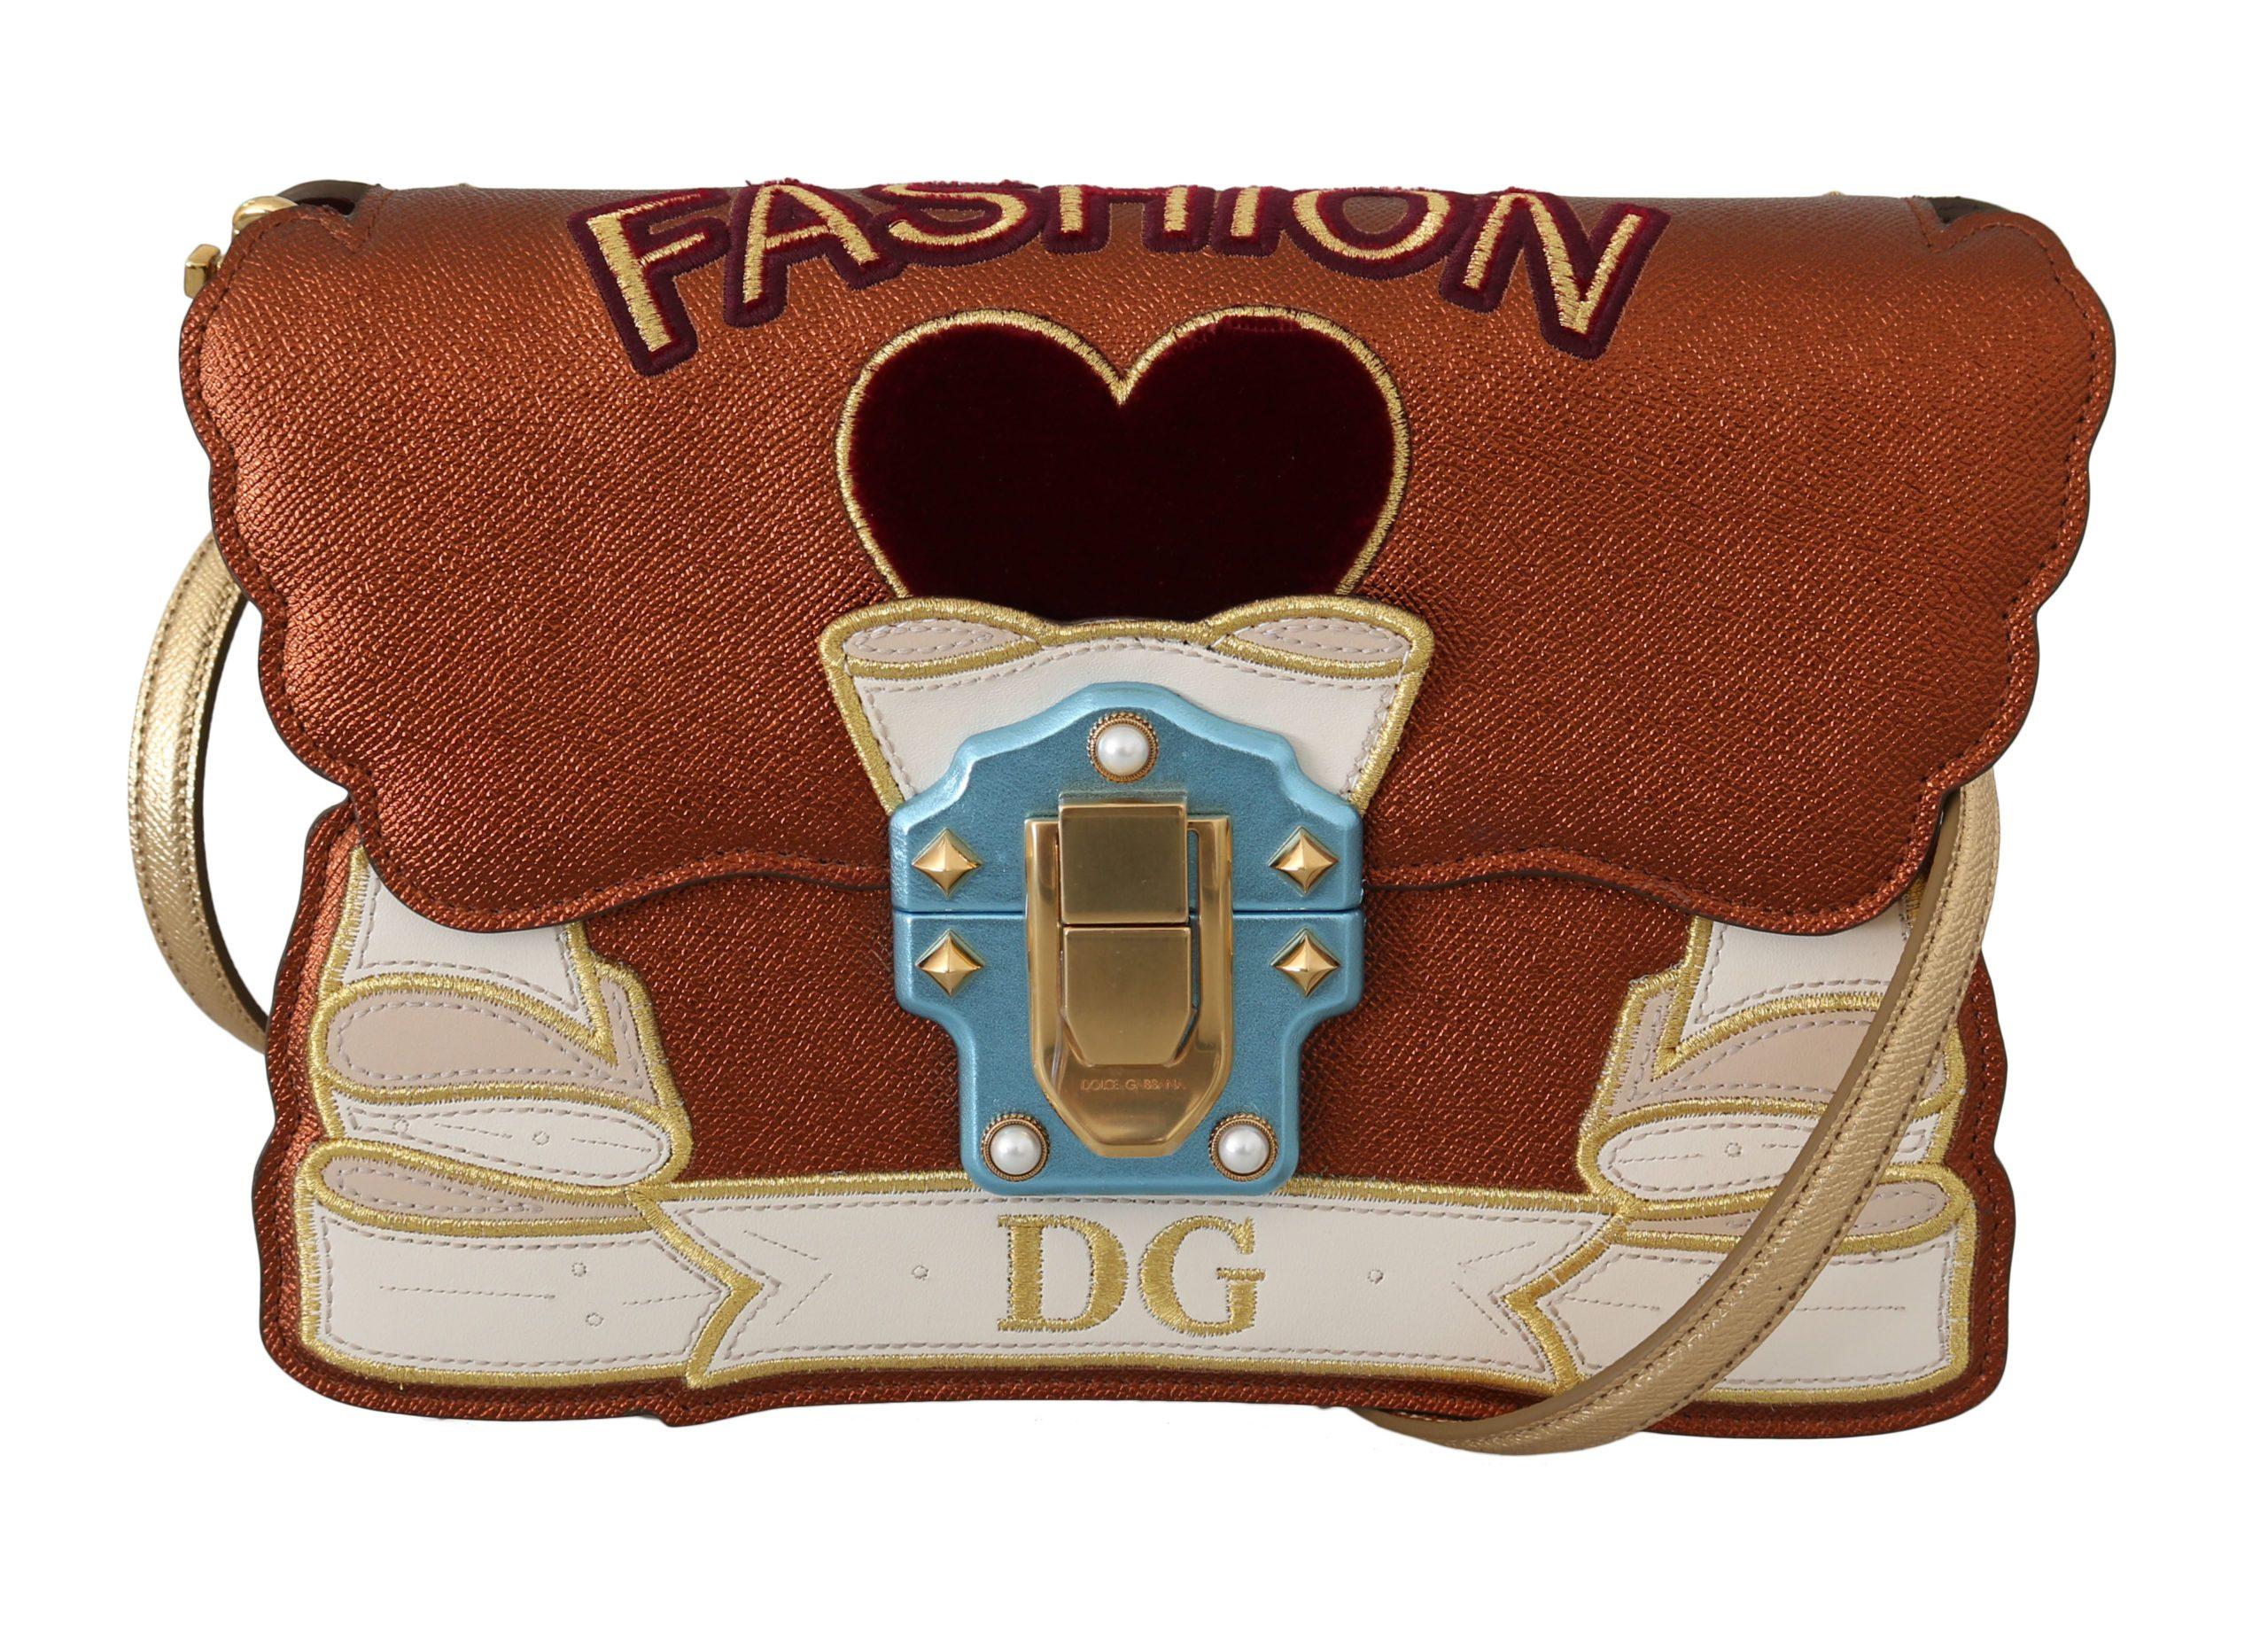 Dolce & Gabbana Women's Leather LUCIA FASHION Shoulder Bag Multicolor VA8848